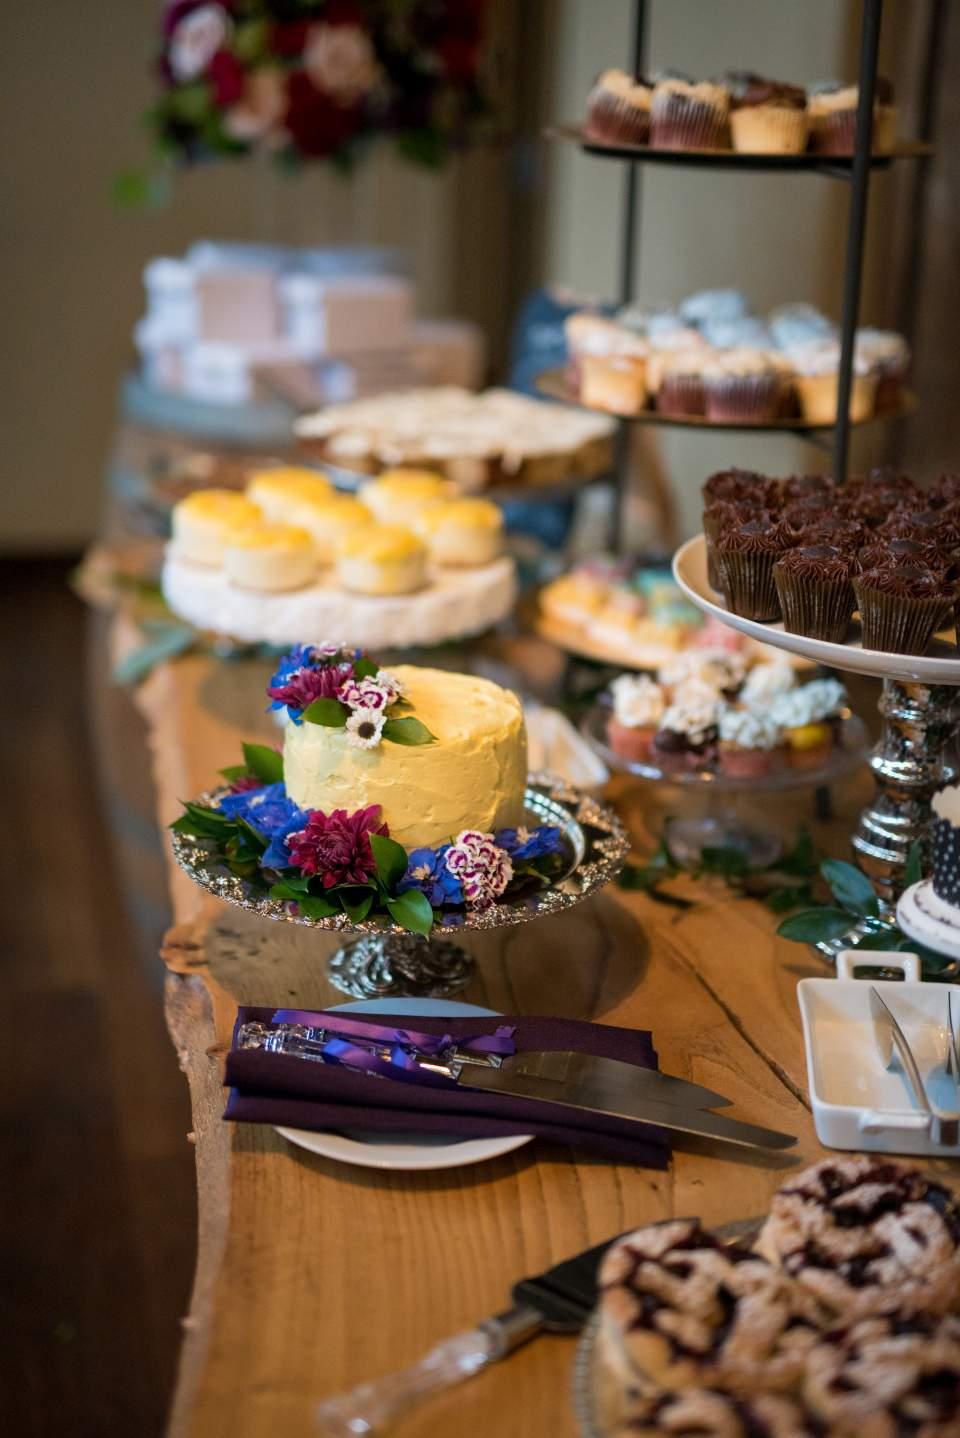 guests bring wedding desserts for homemade dessert bar